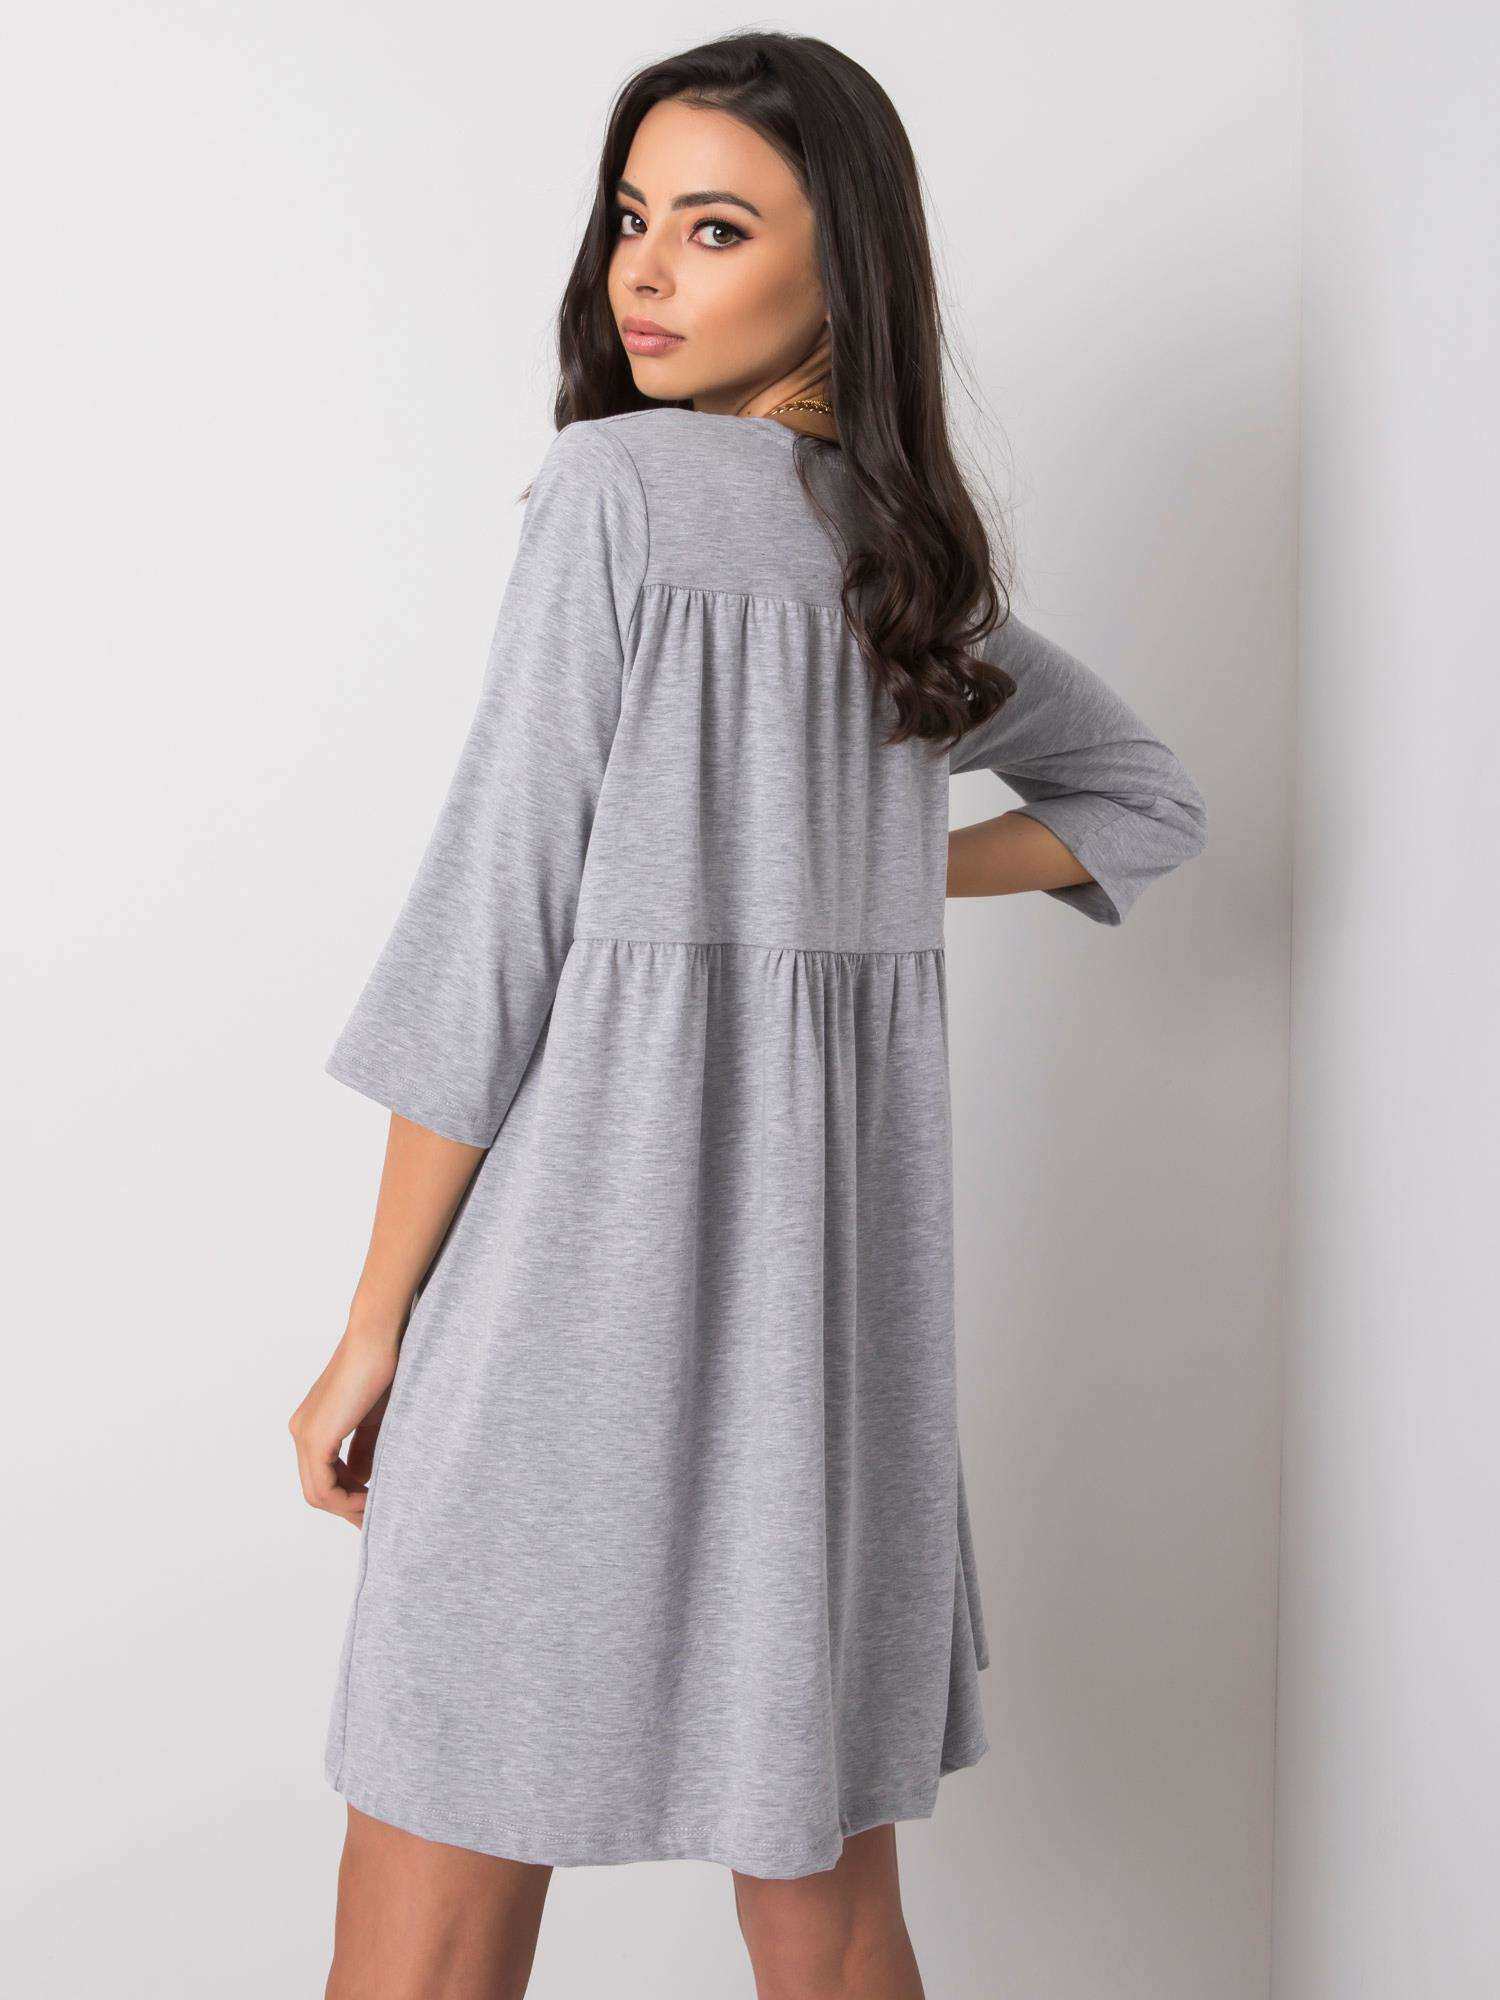 Šedé voľné šaty L / XL